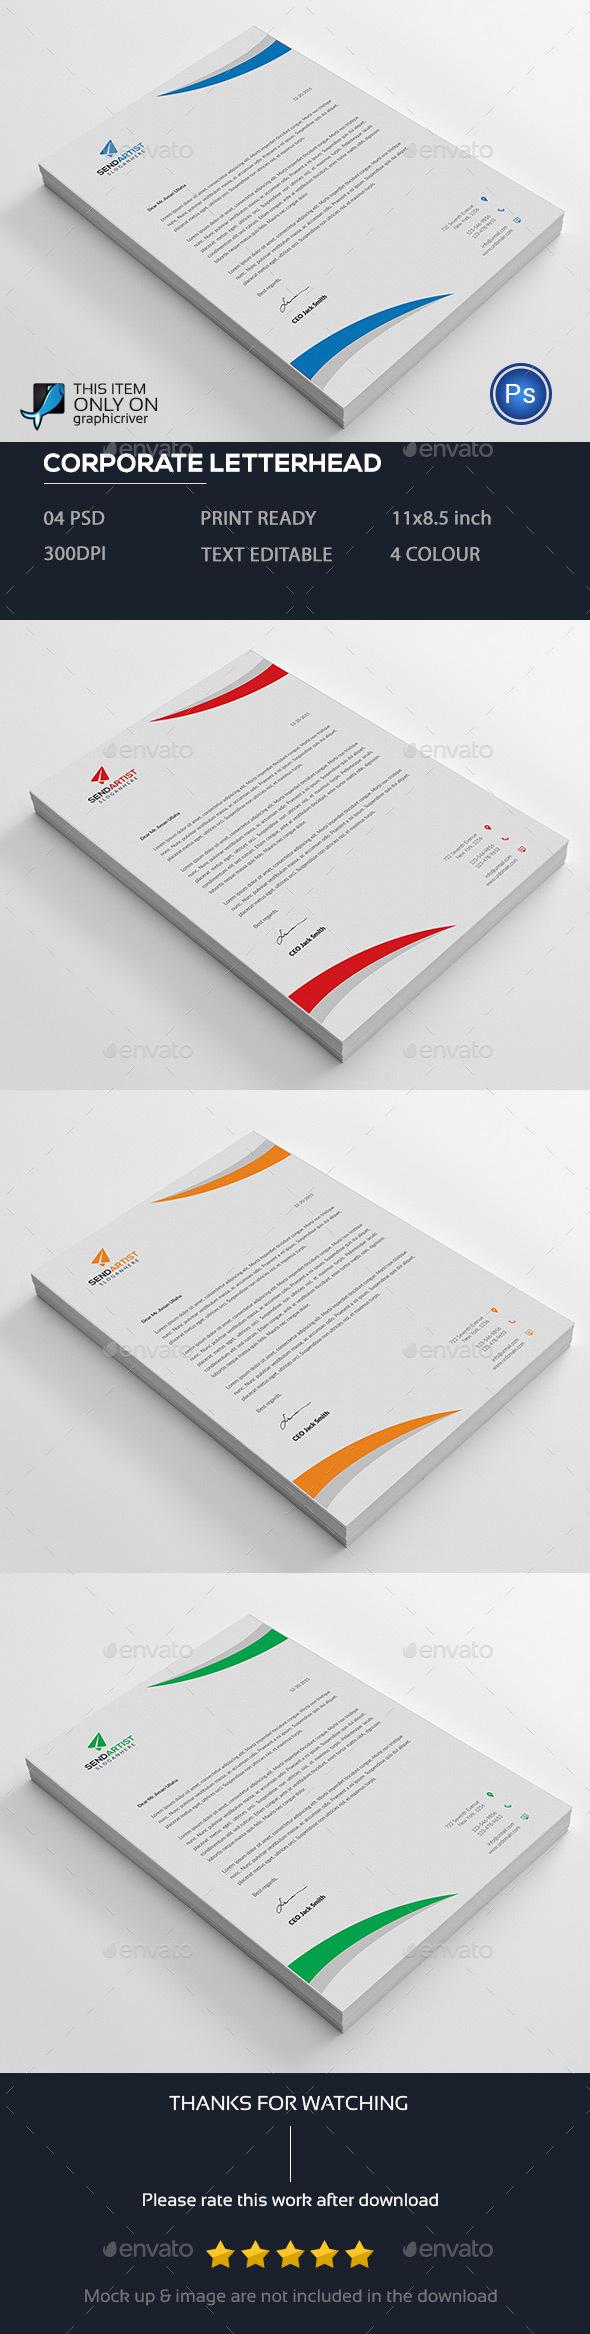 Letterhead template by designstemplate graphicriver letterhead template stationery print templates spiritdancerdesigns Choice Image